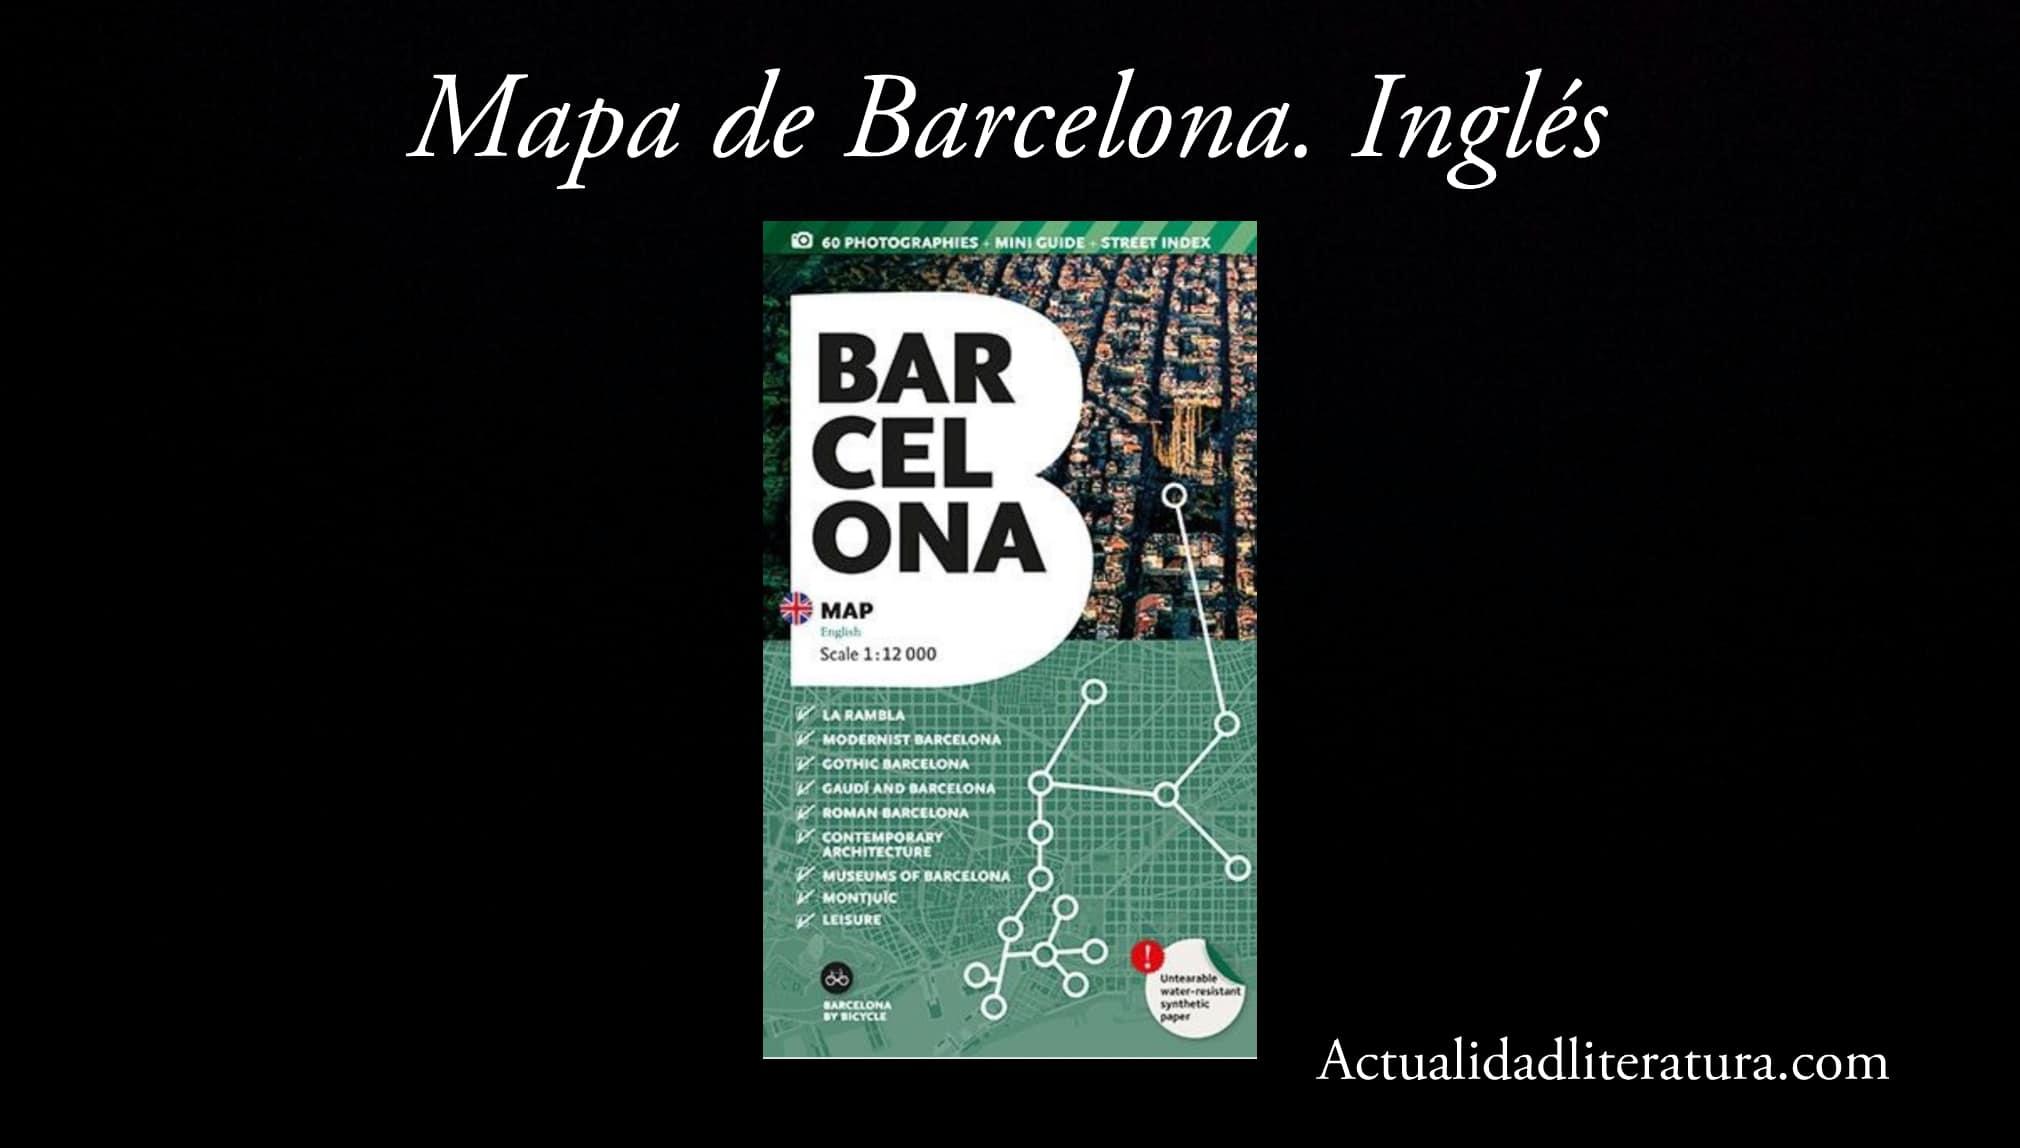 Mapa de Barcelona. Inglés.